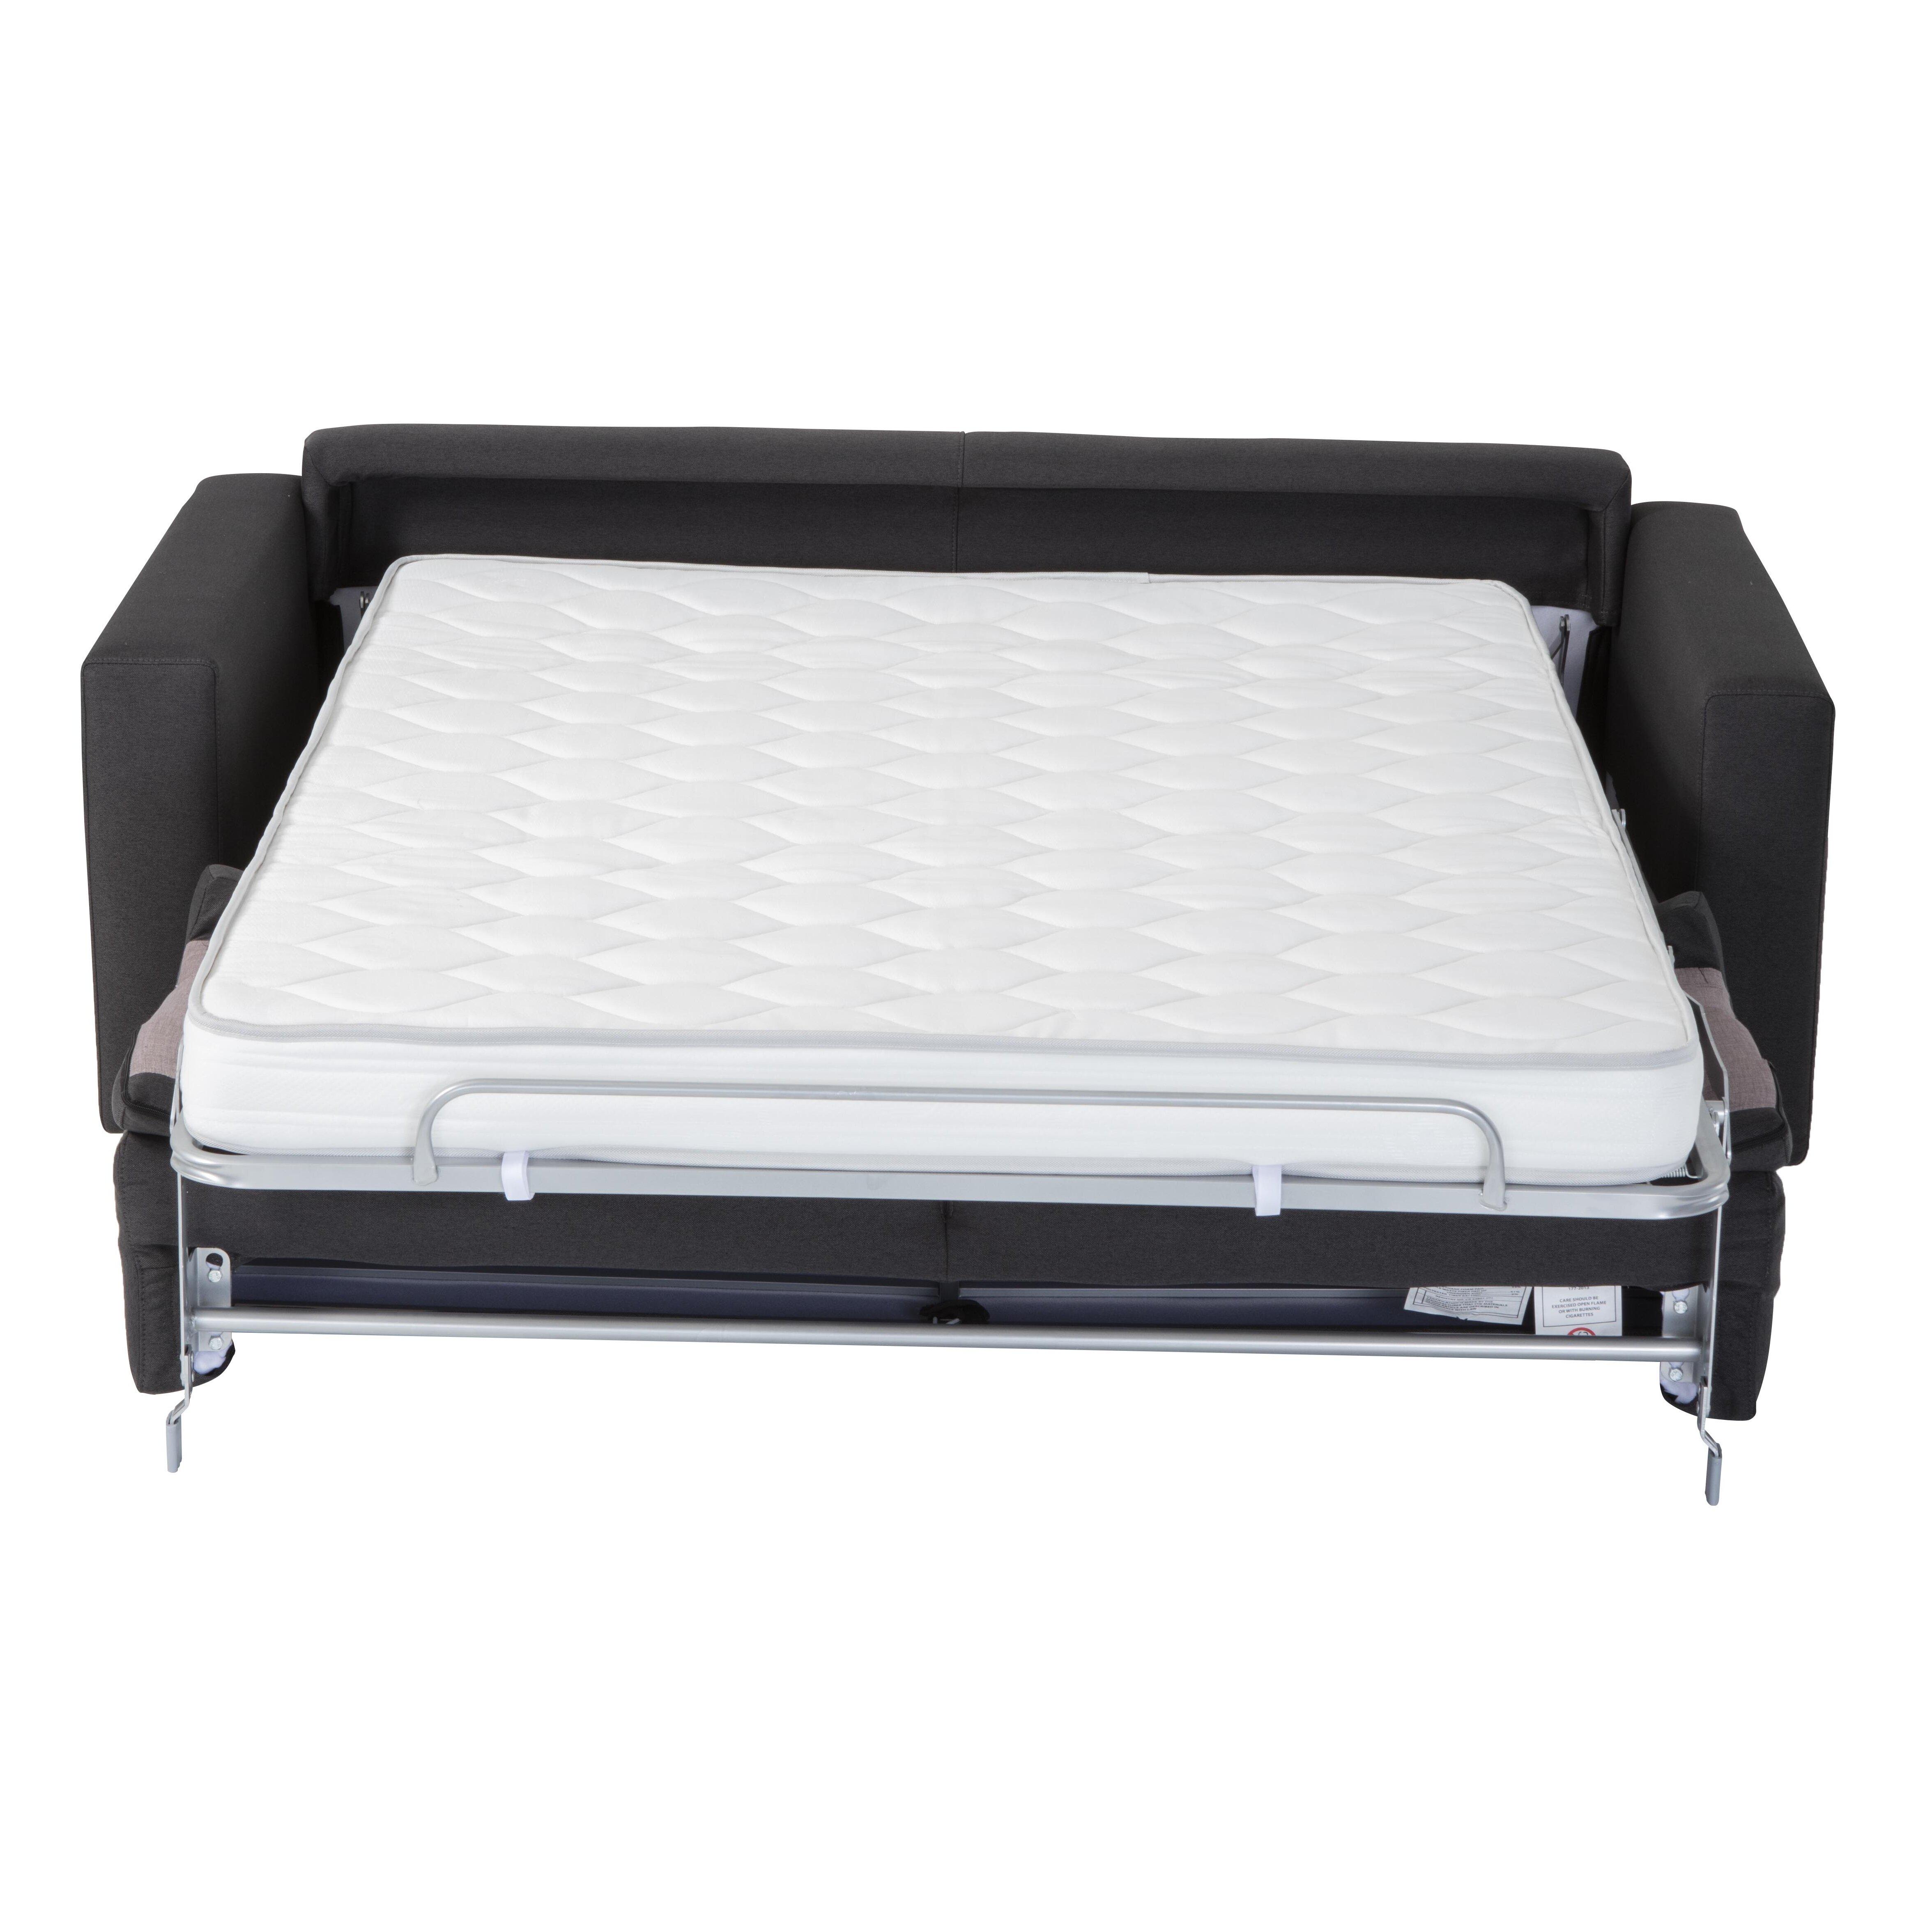 Pezzan usa breeze sleeper sofa reviews wayfair for Buy sofa online usa